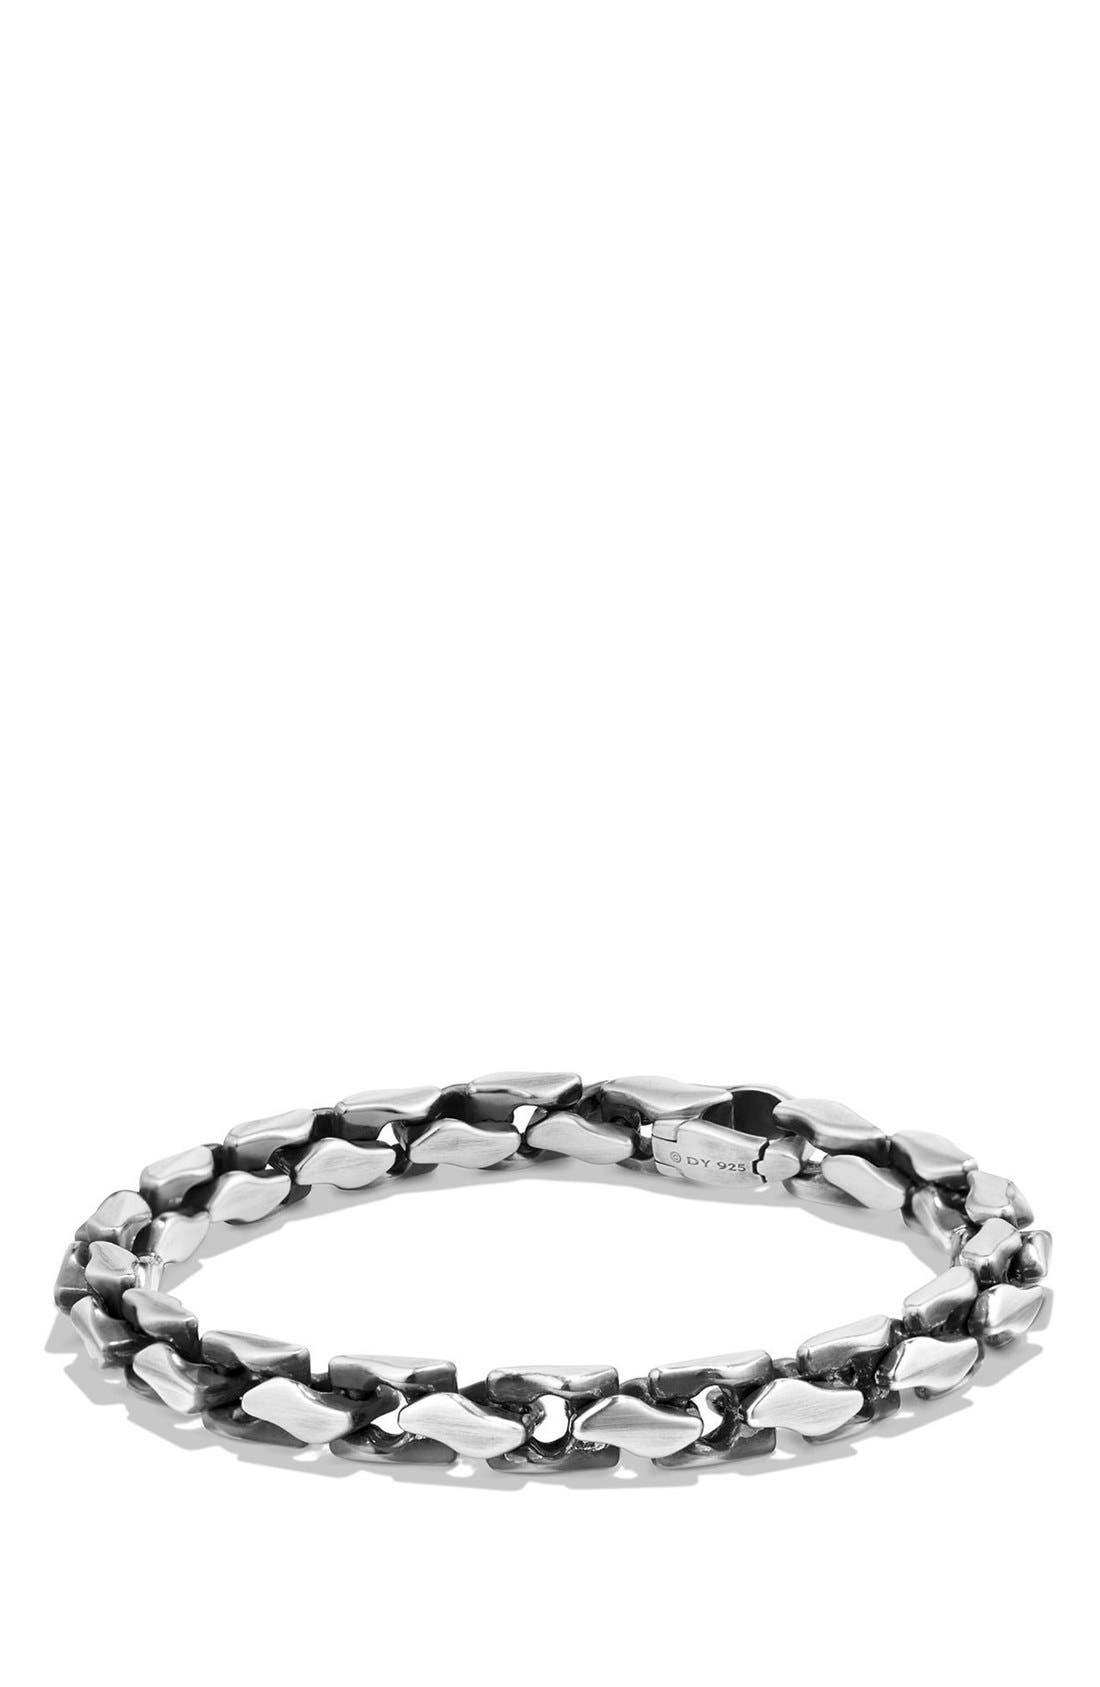 Main Image - David Yurman 'Chain' Large Fluted Chain Bracelet